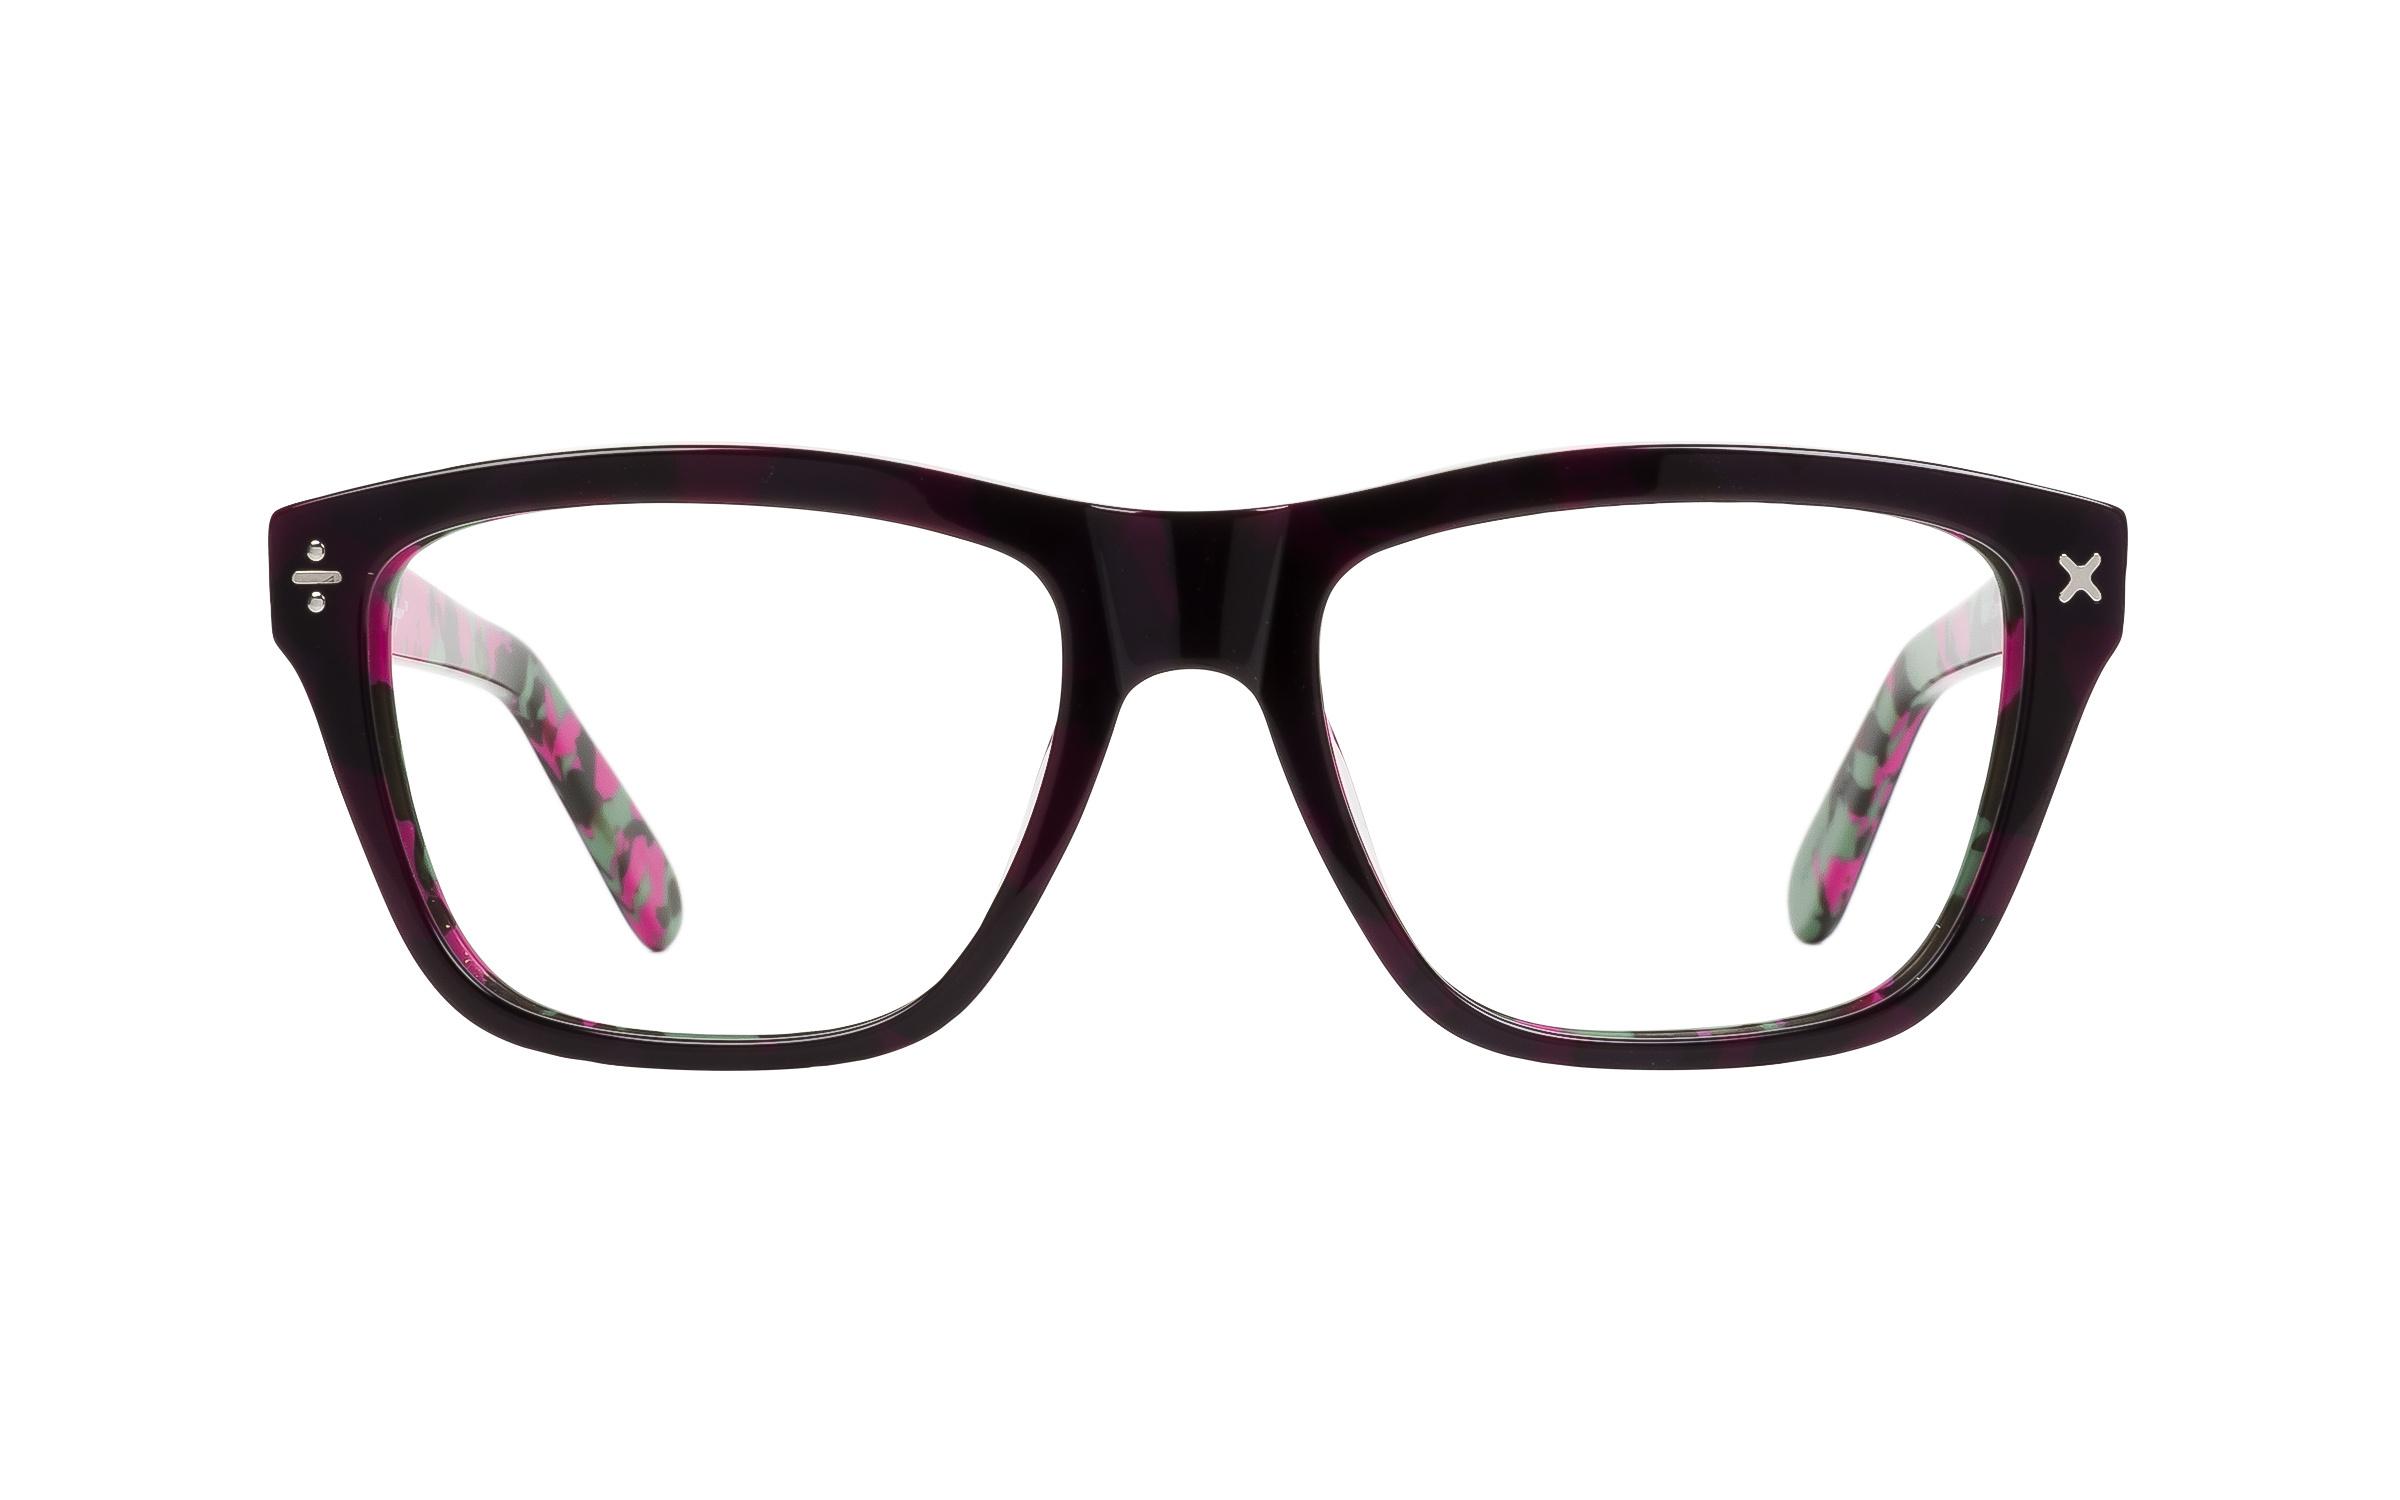 Women's Vintage Glasses Purple Derek Cardigan Online Clearly